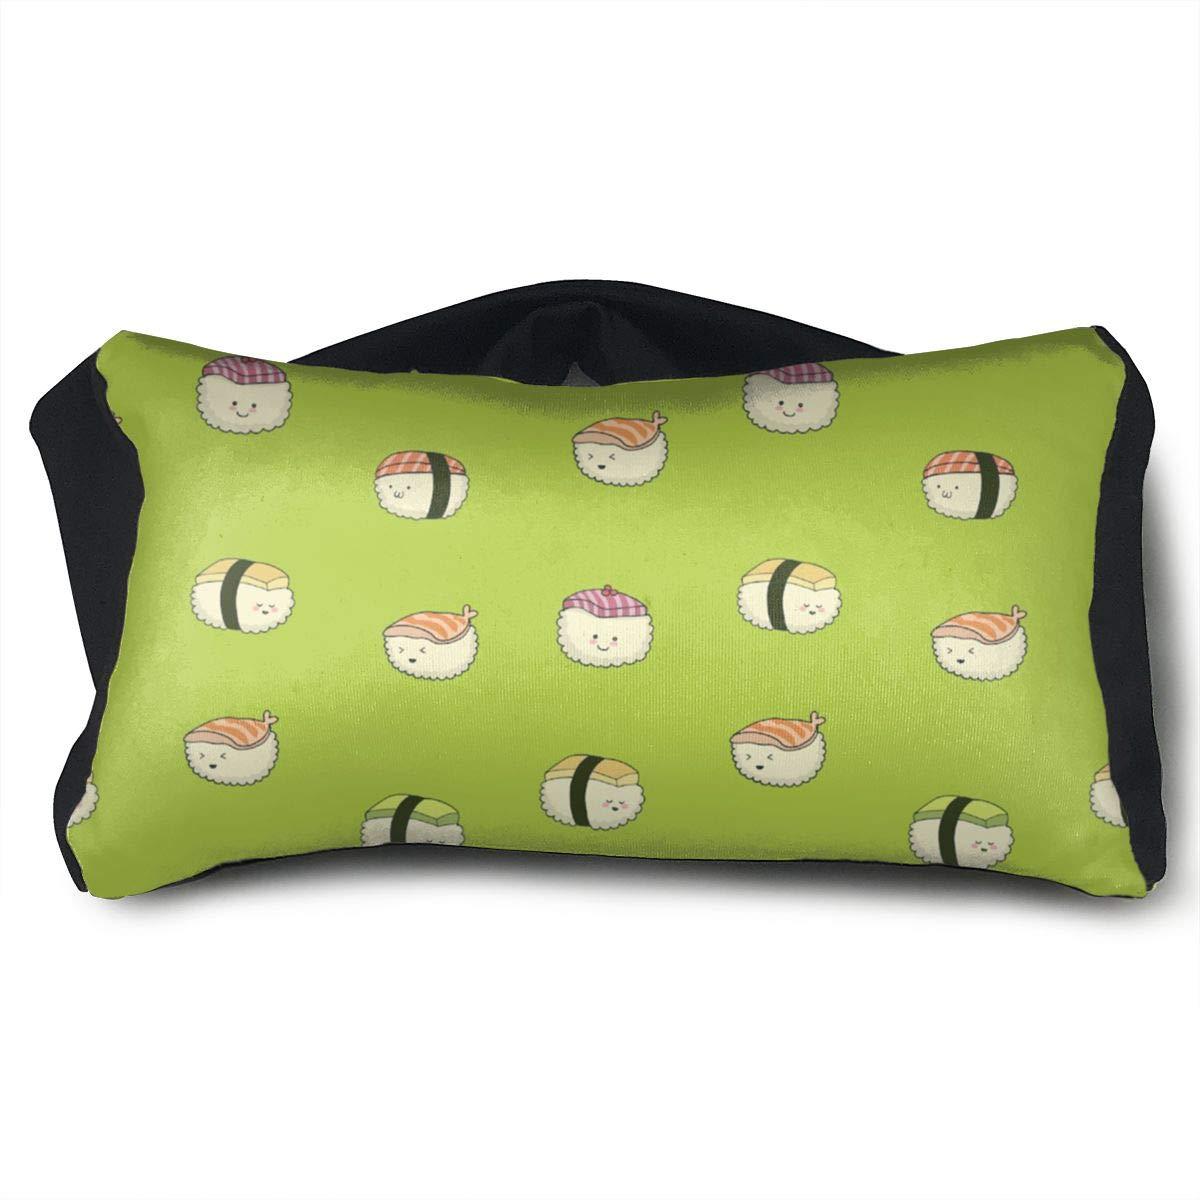 Eye Pillow Sleep Mask for Sleeping Migraine Headaches Stress Relief Sushi Pattern Eyeshade